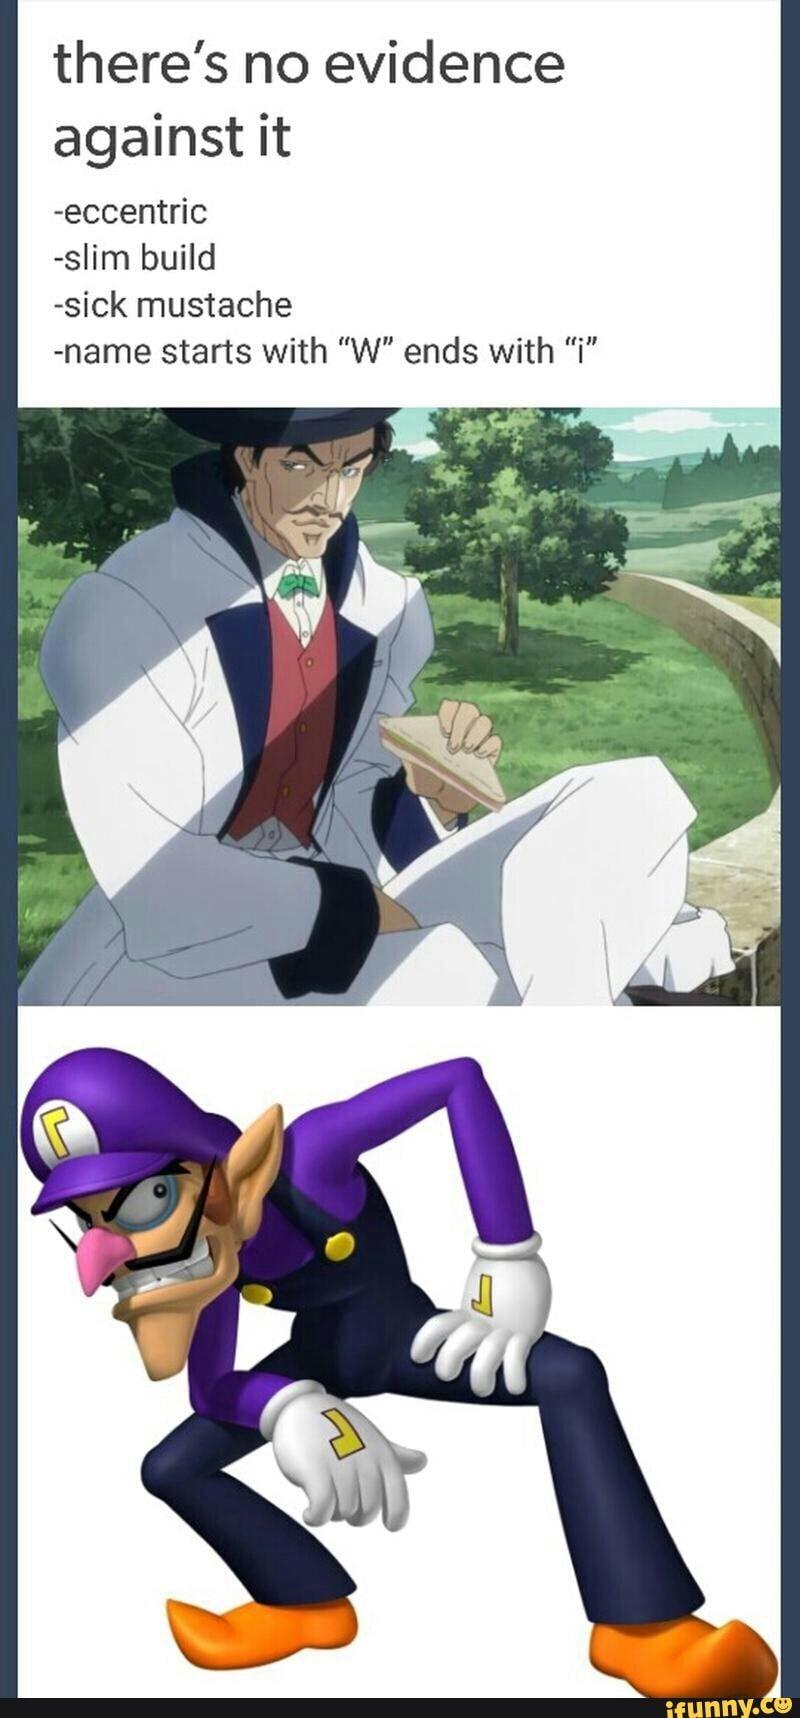 be12cedcf71fd064c0c34c9d39067cad very funny ) jojokes pinterest jojo memes, anime and jojo bizarre